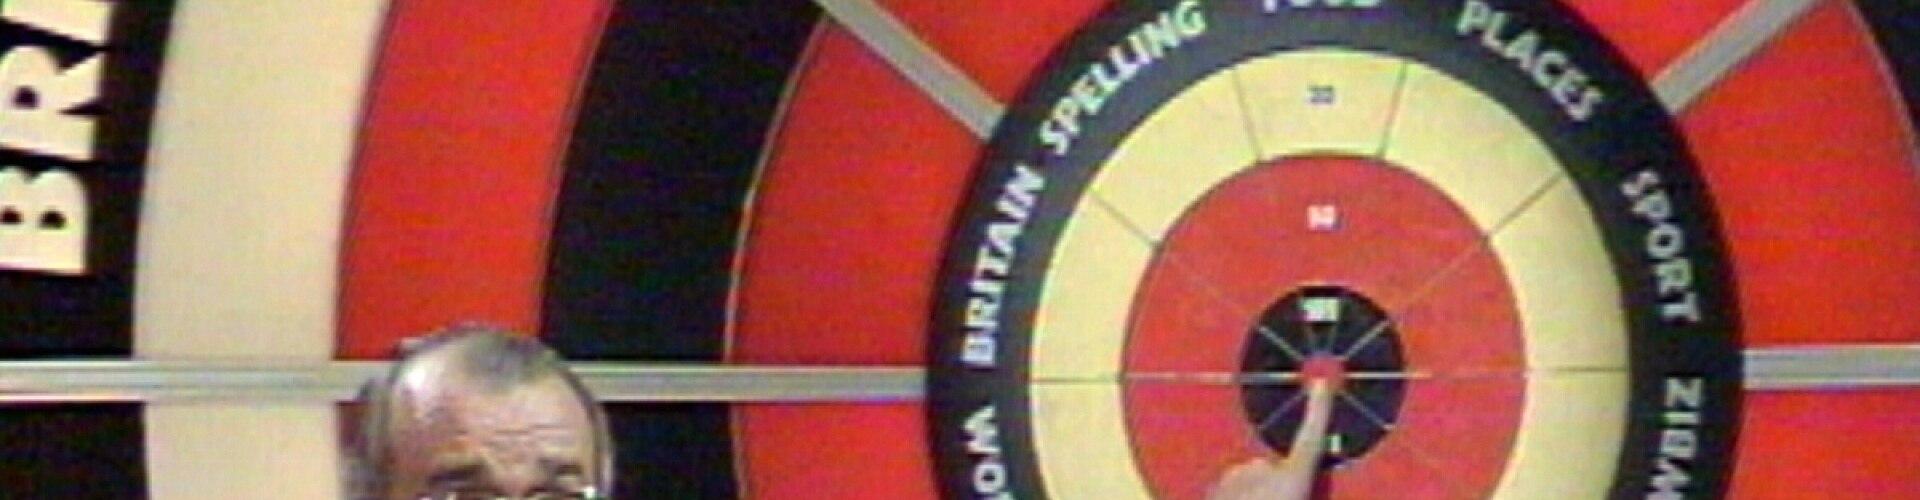 Watch Bullseye Online